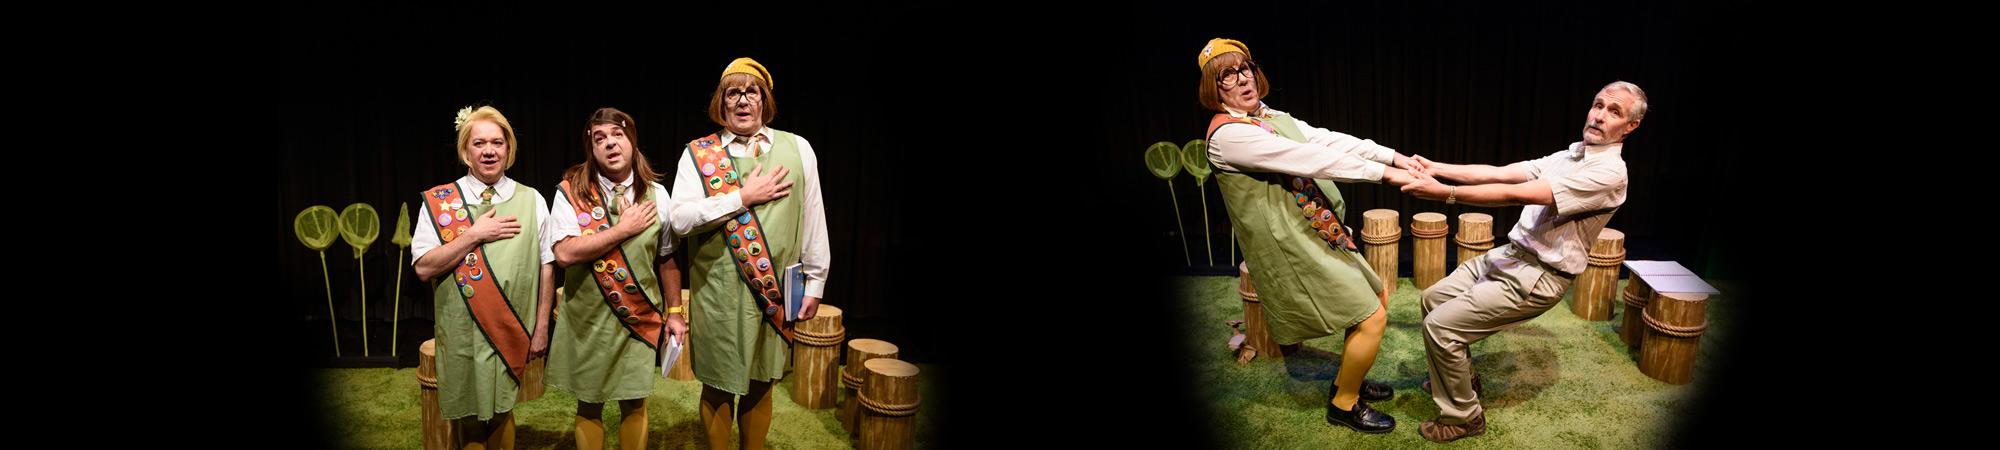 Northern Light Theatre | Flora & Fawna's Fieldtrip with Fleurette